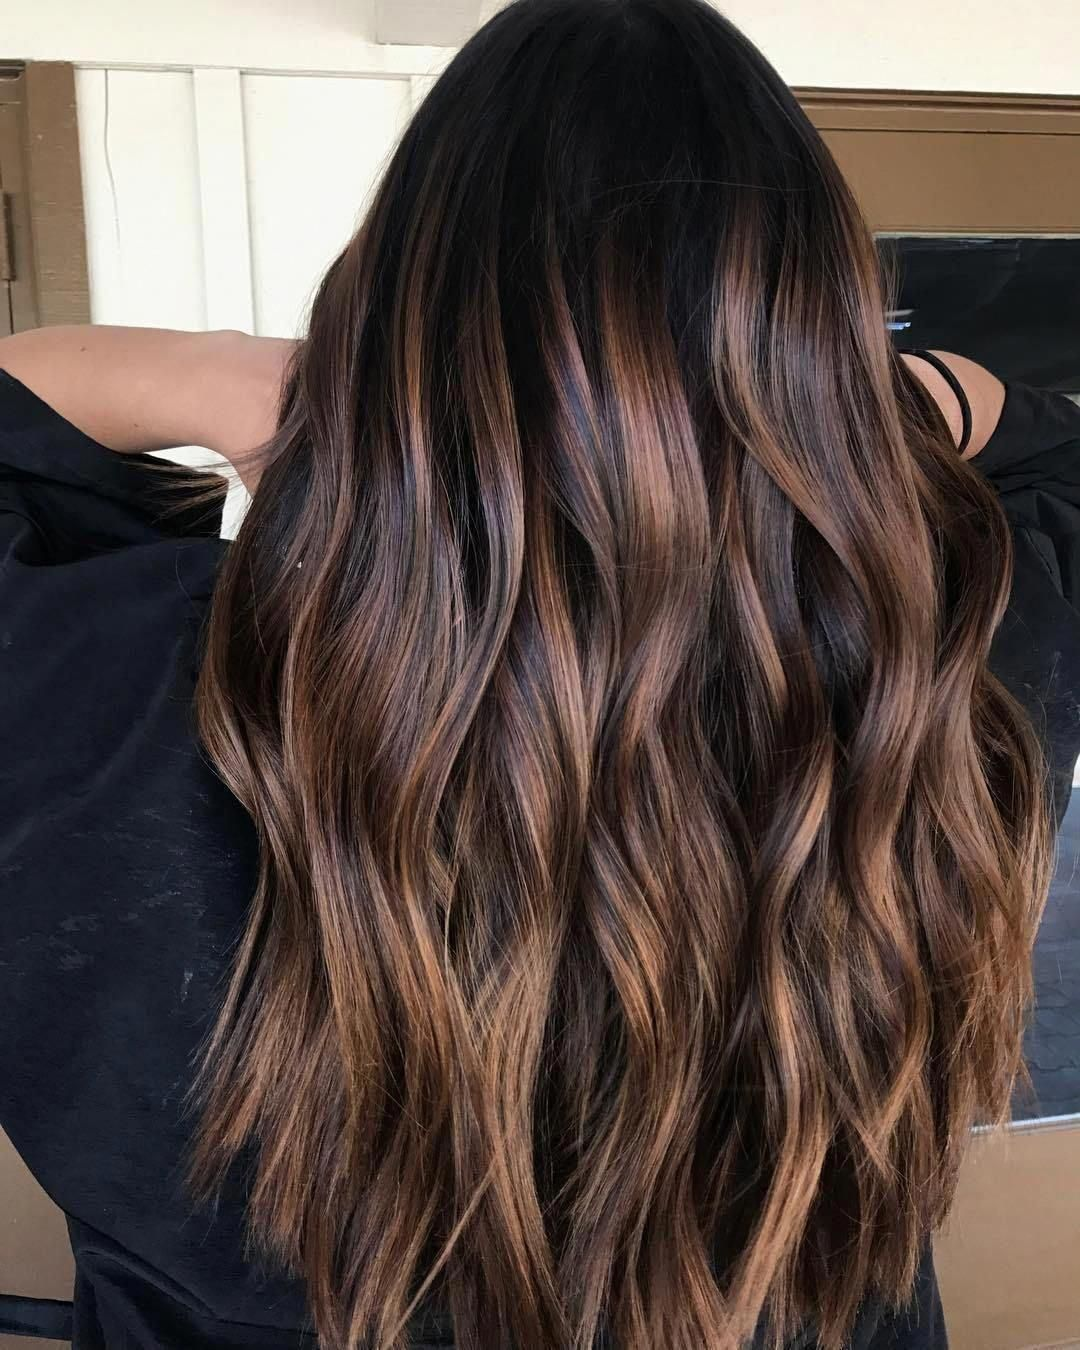 60 Hairstyles Featuring Dark Brown Hair With Highlights Hairhighlights Brownhair Darkbrownhair In 2020 Hair Color For Black Hair Hair Styles Long Brown Hair